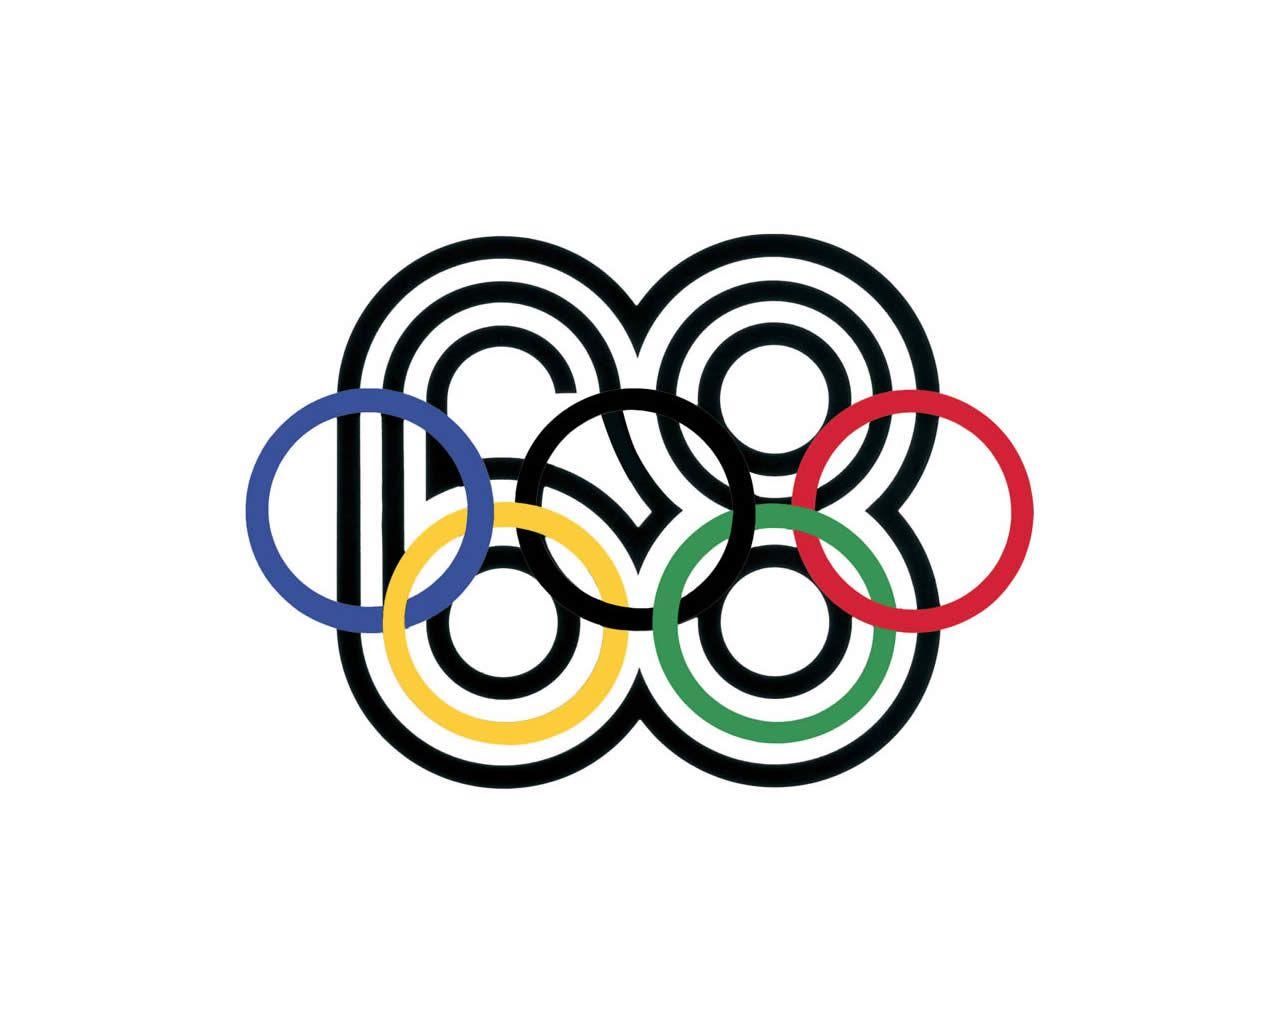 1968 mexico olympics logo ideas pinterest olympic logo rh pinterest com mexican logos pictures mexican logos pictures